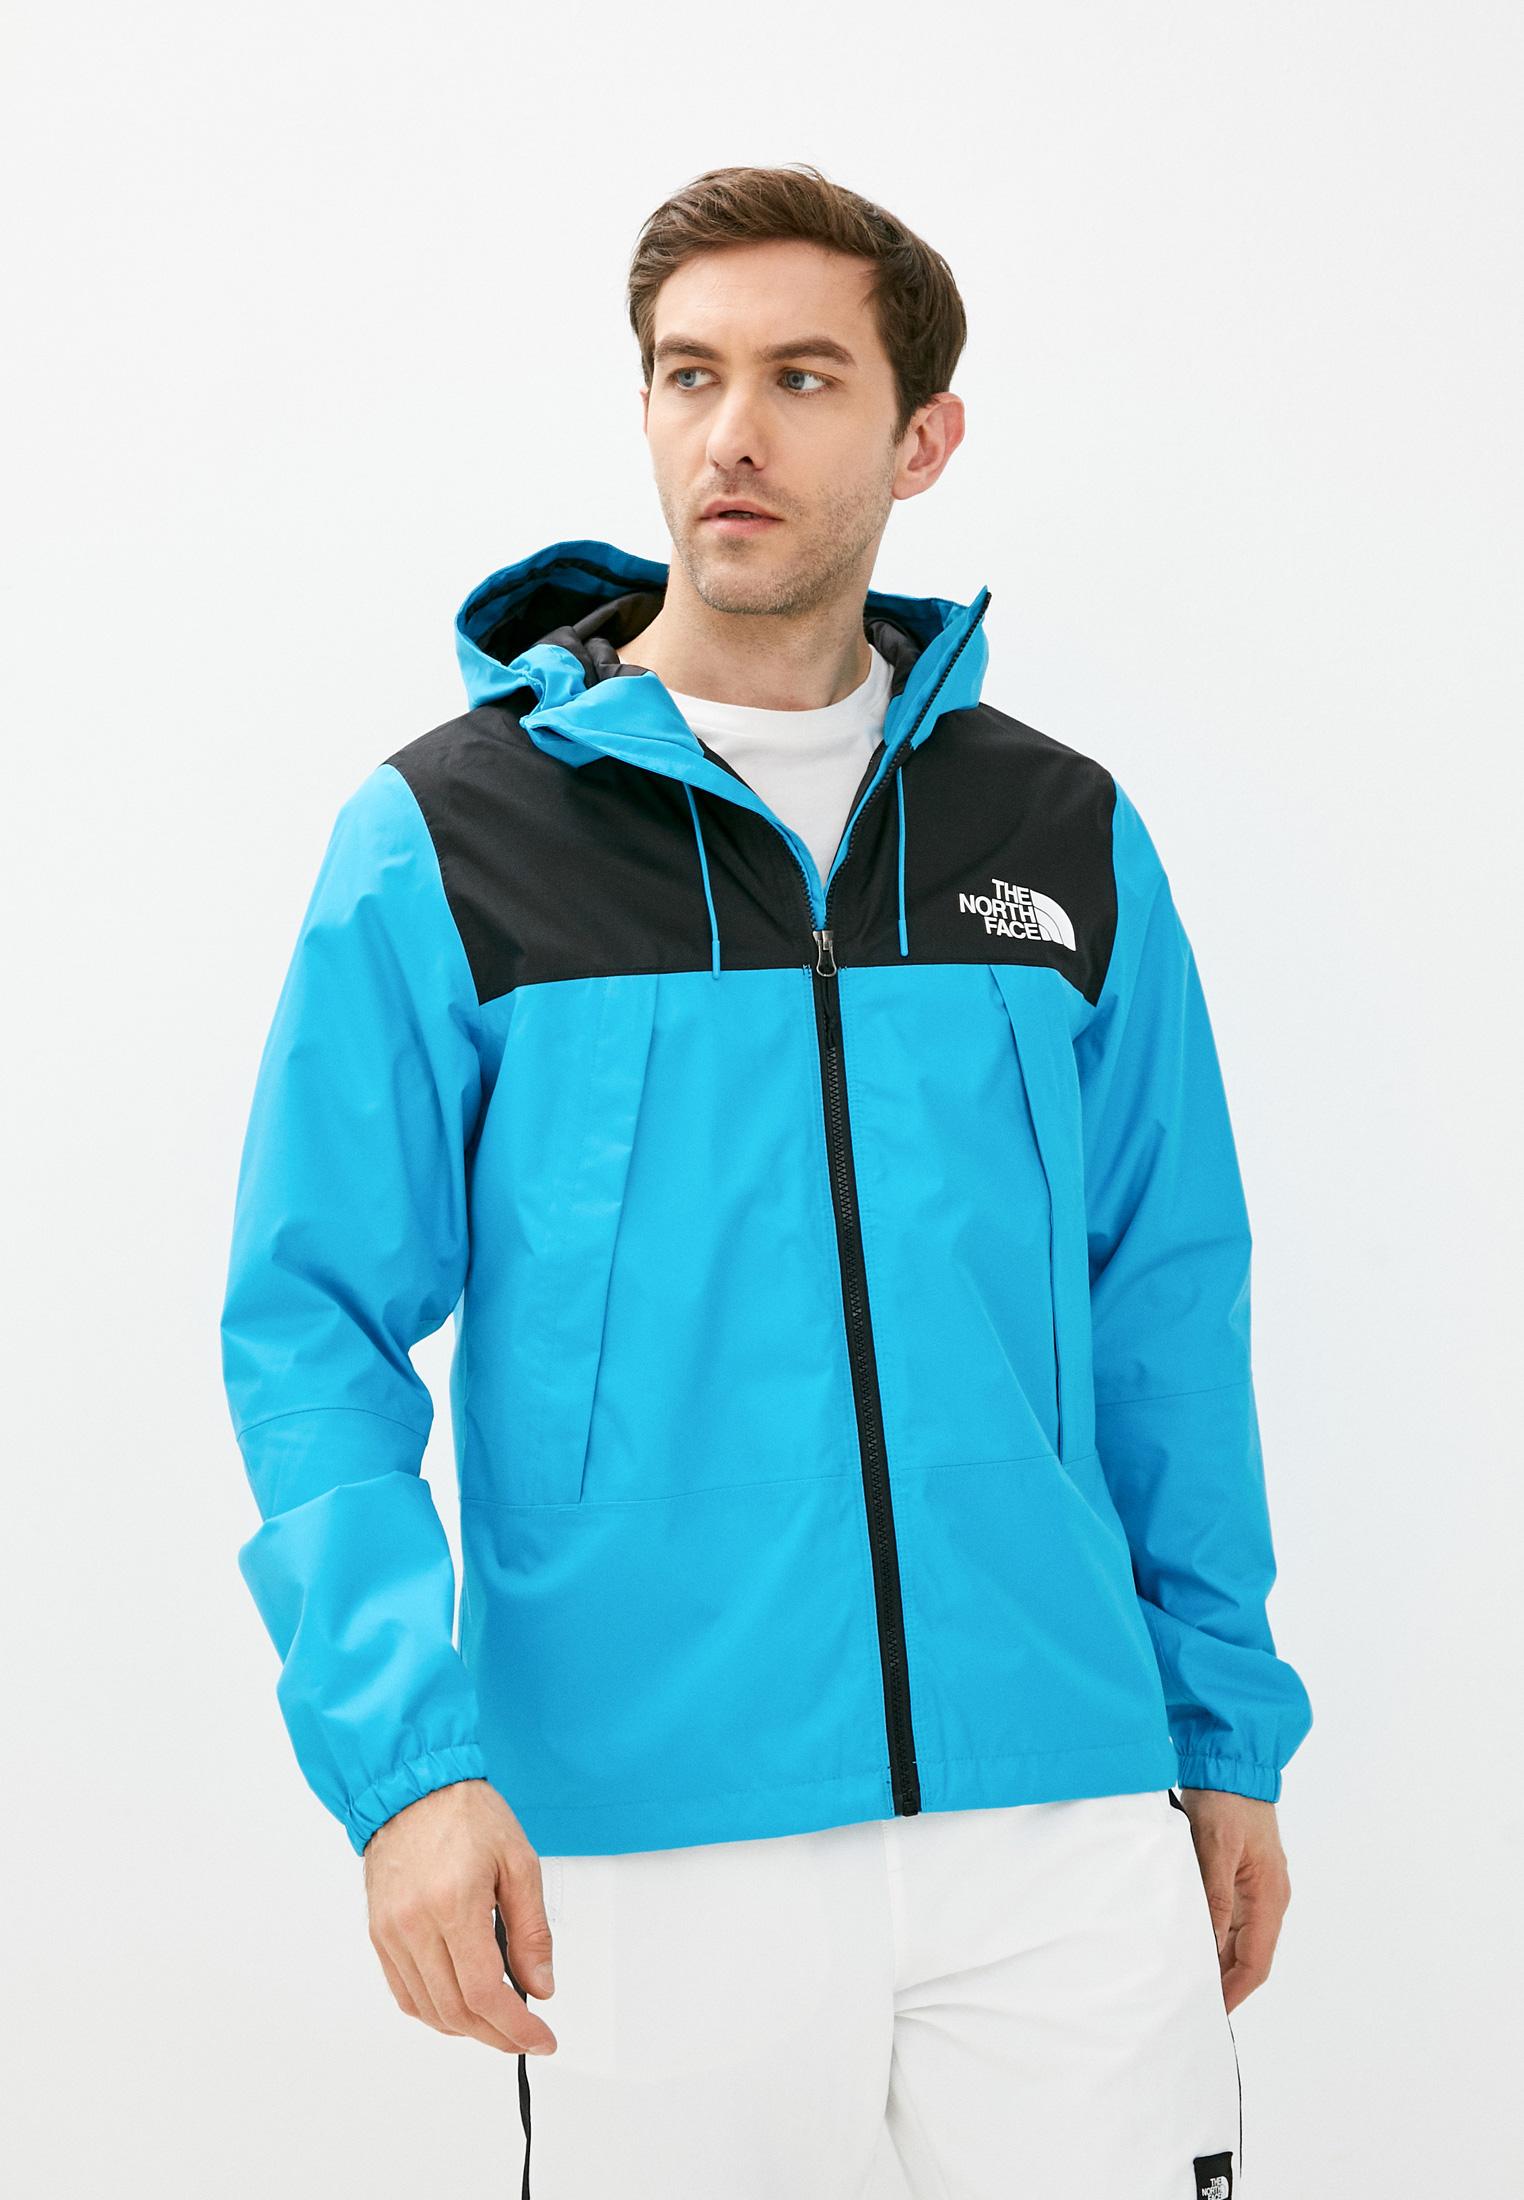 Мужская верхняя одежда The North Face (Зе Норт Фейс) TA2S51